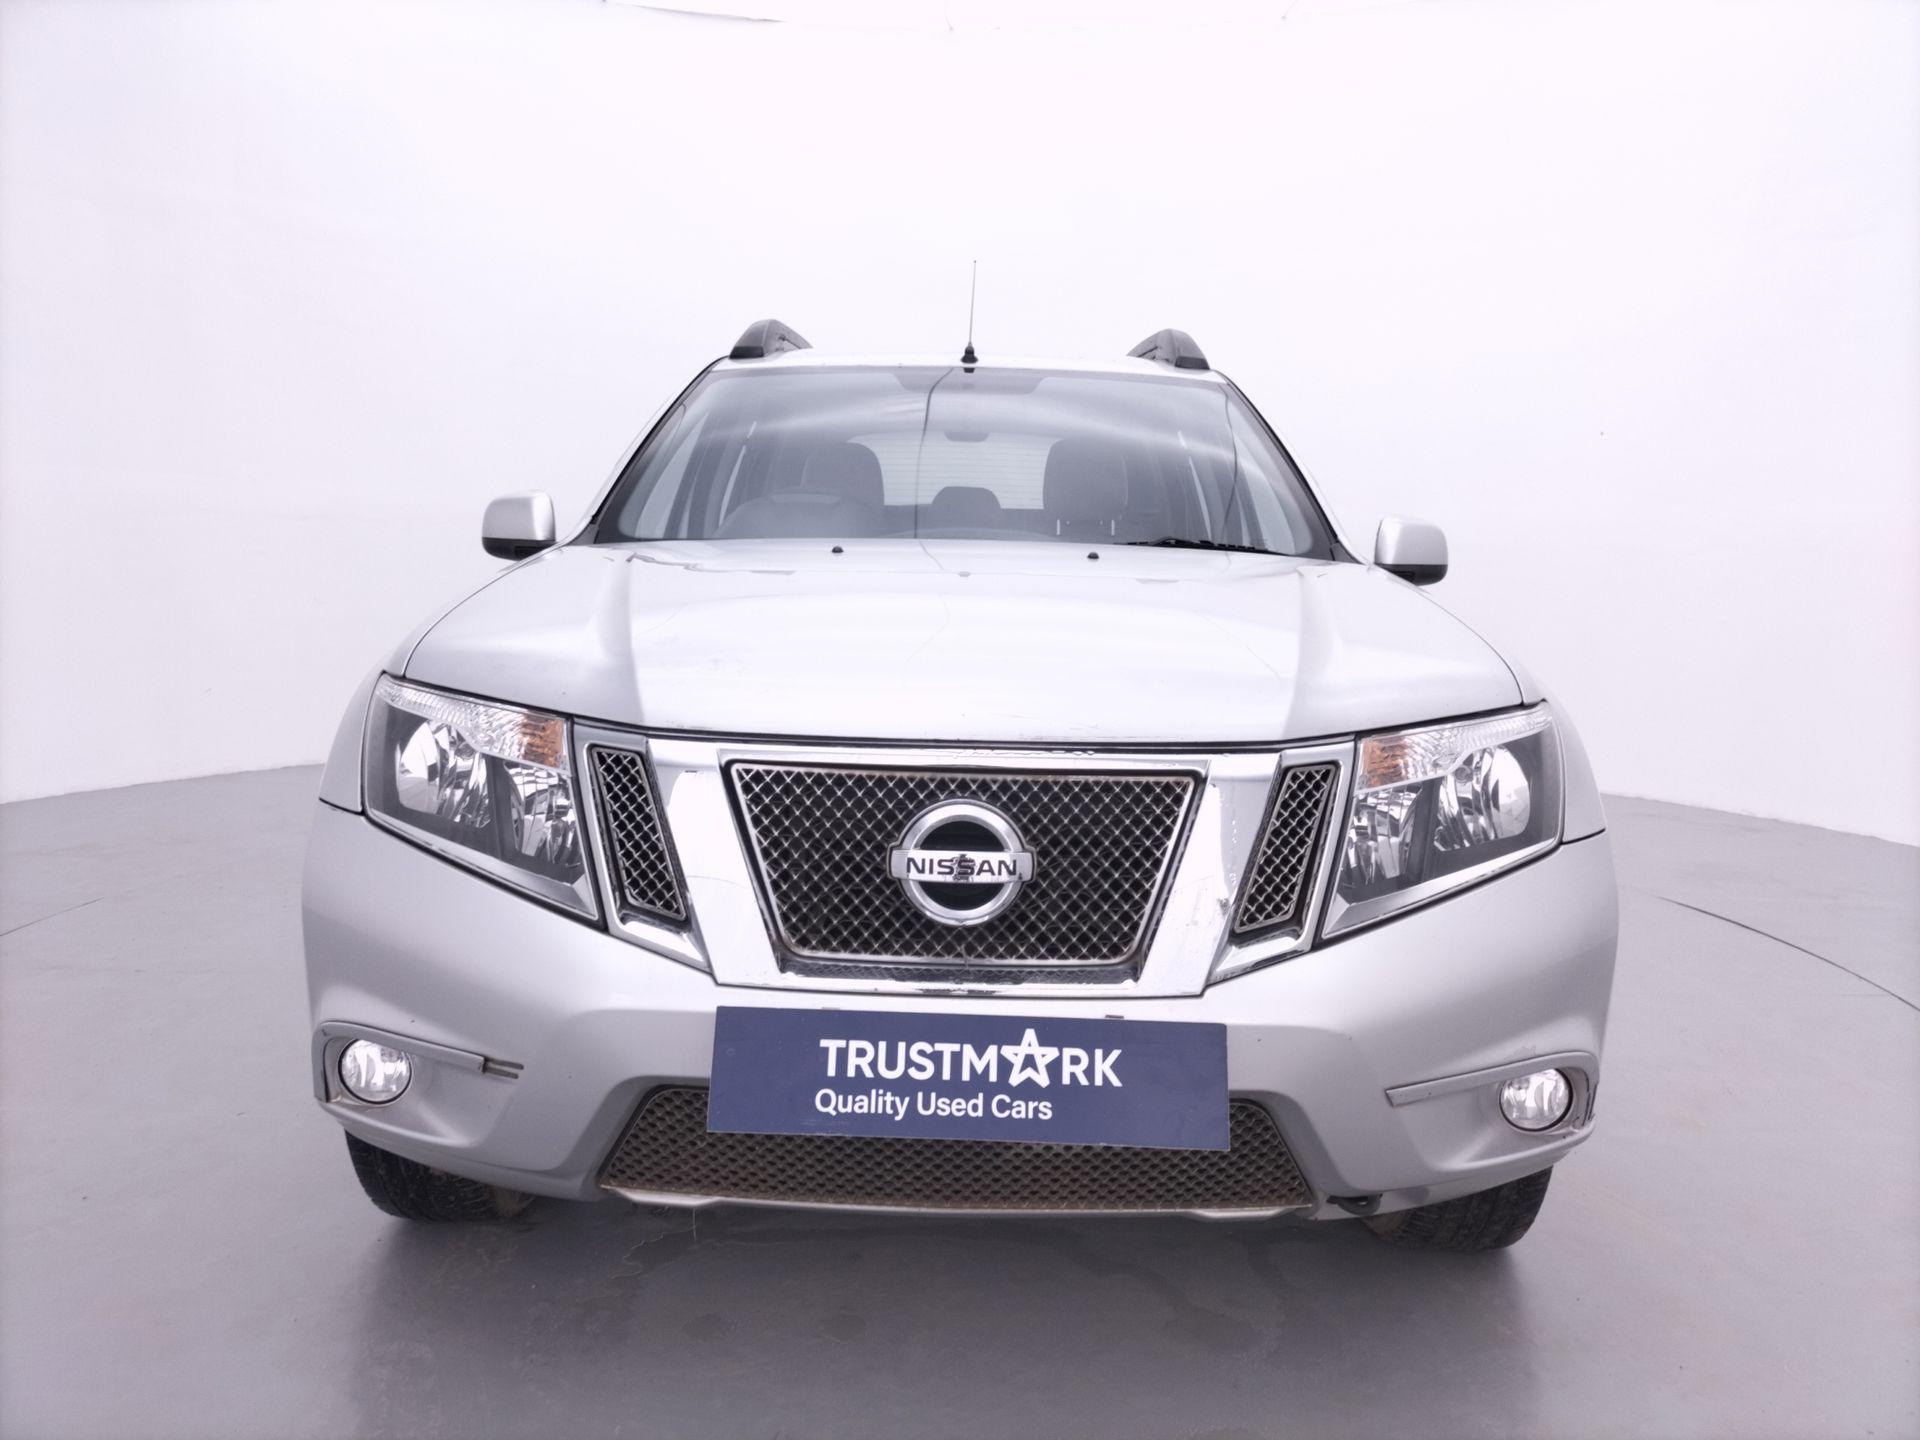 Nissan Terrano XL 85 PS